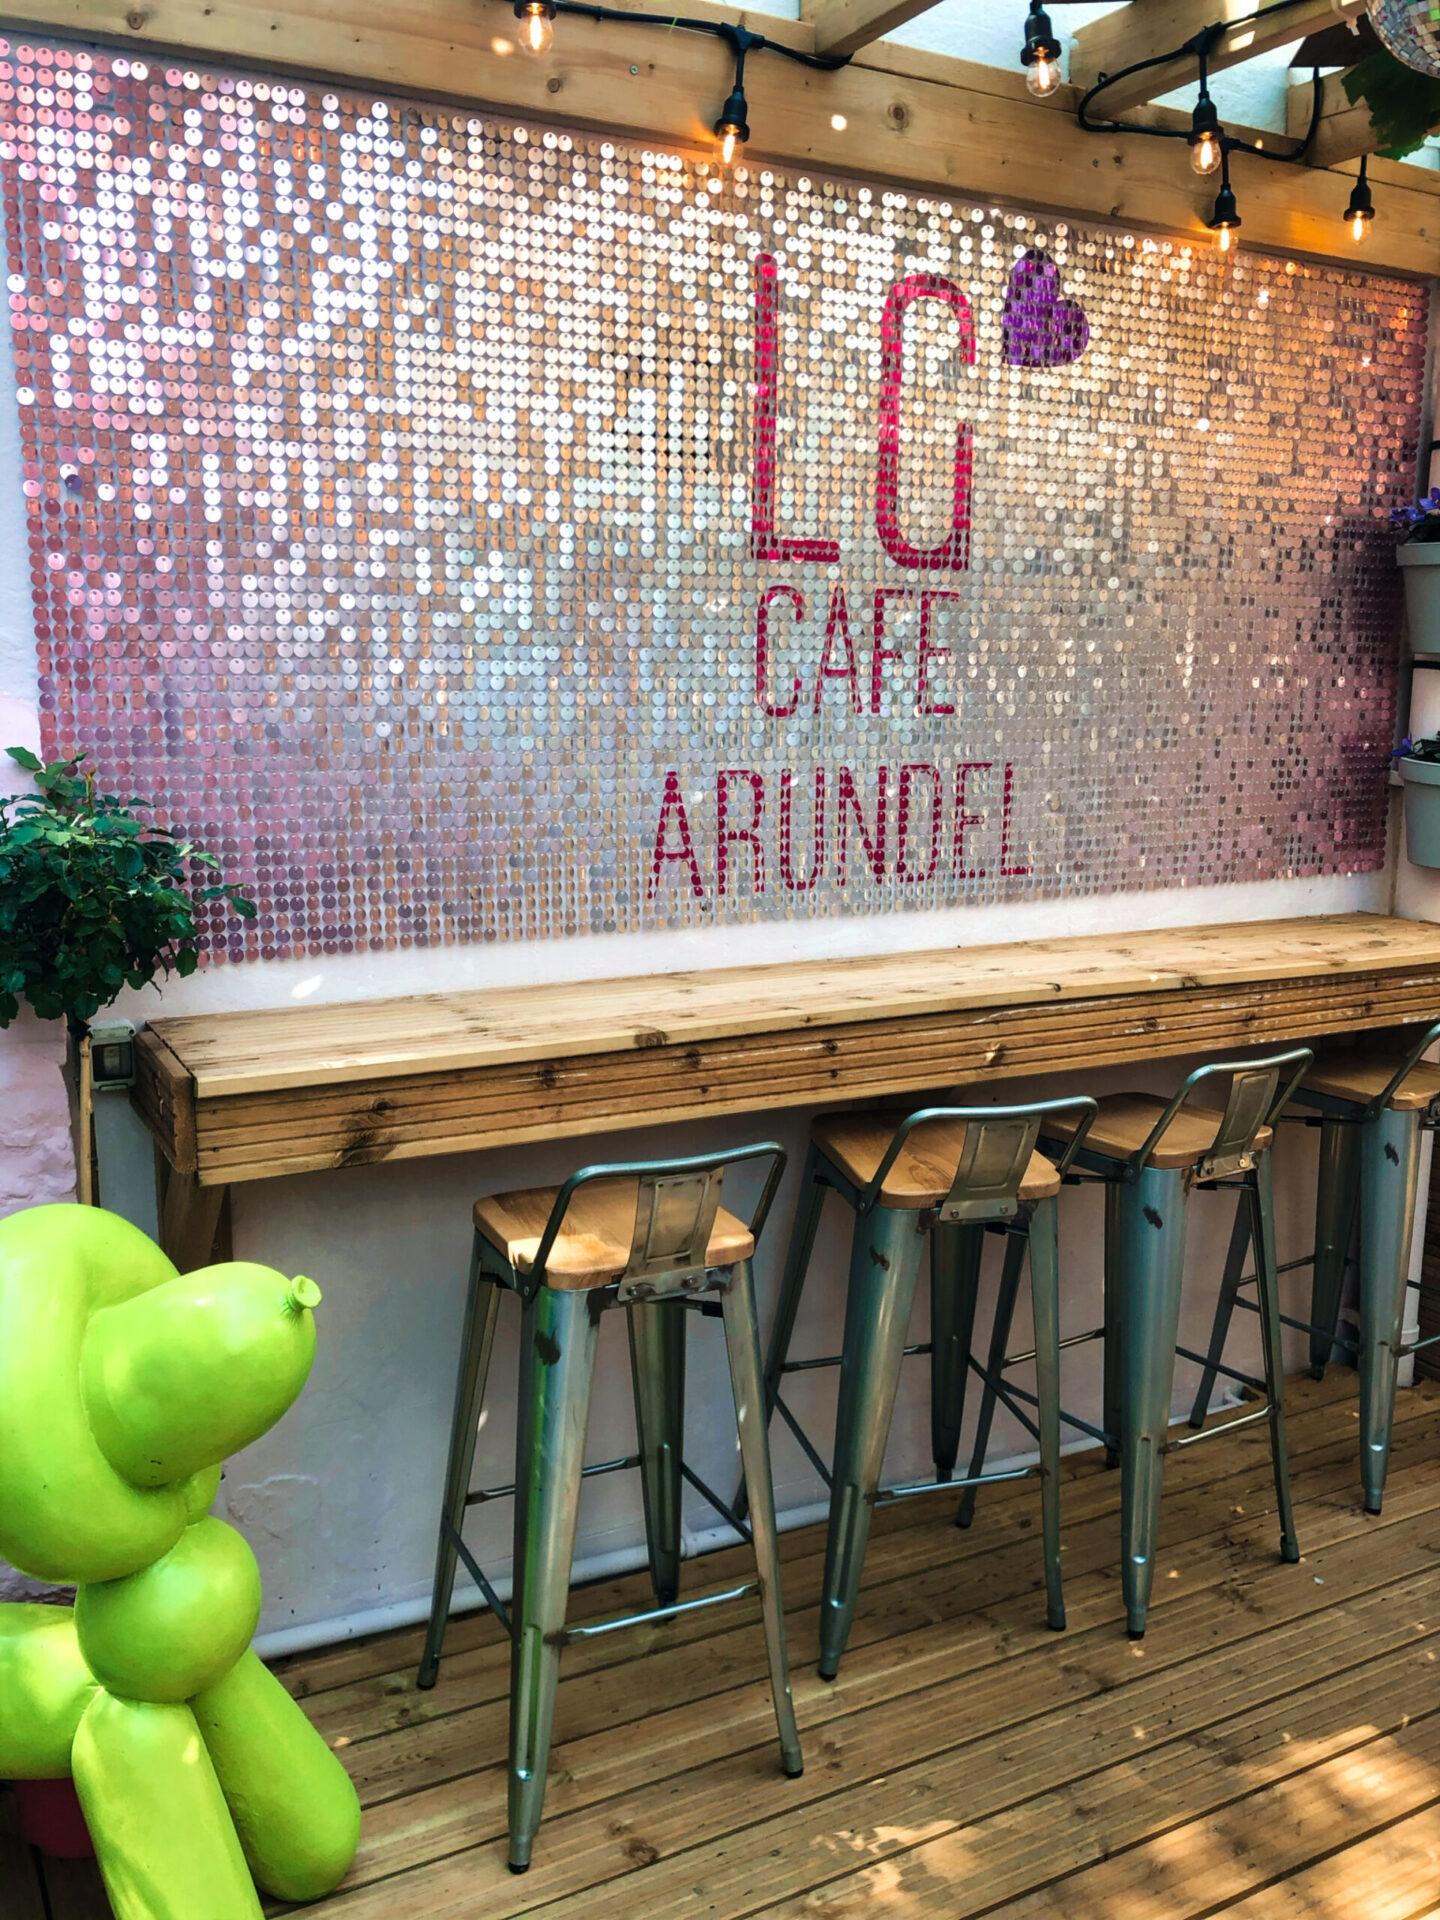 LG Cafe Arundel